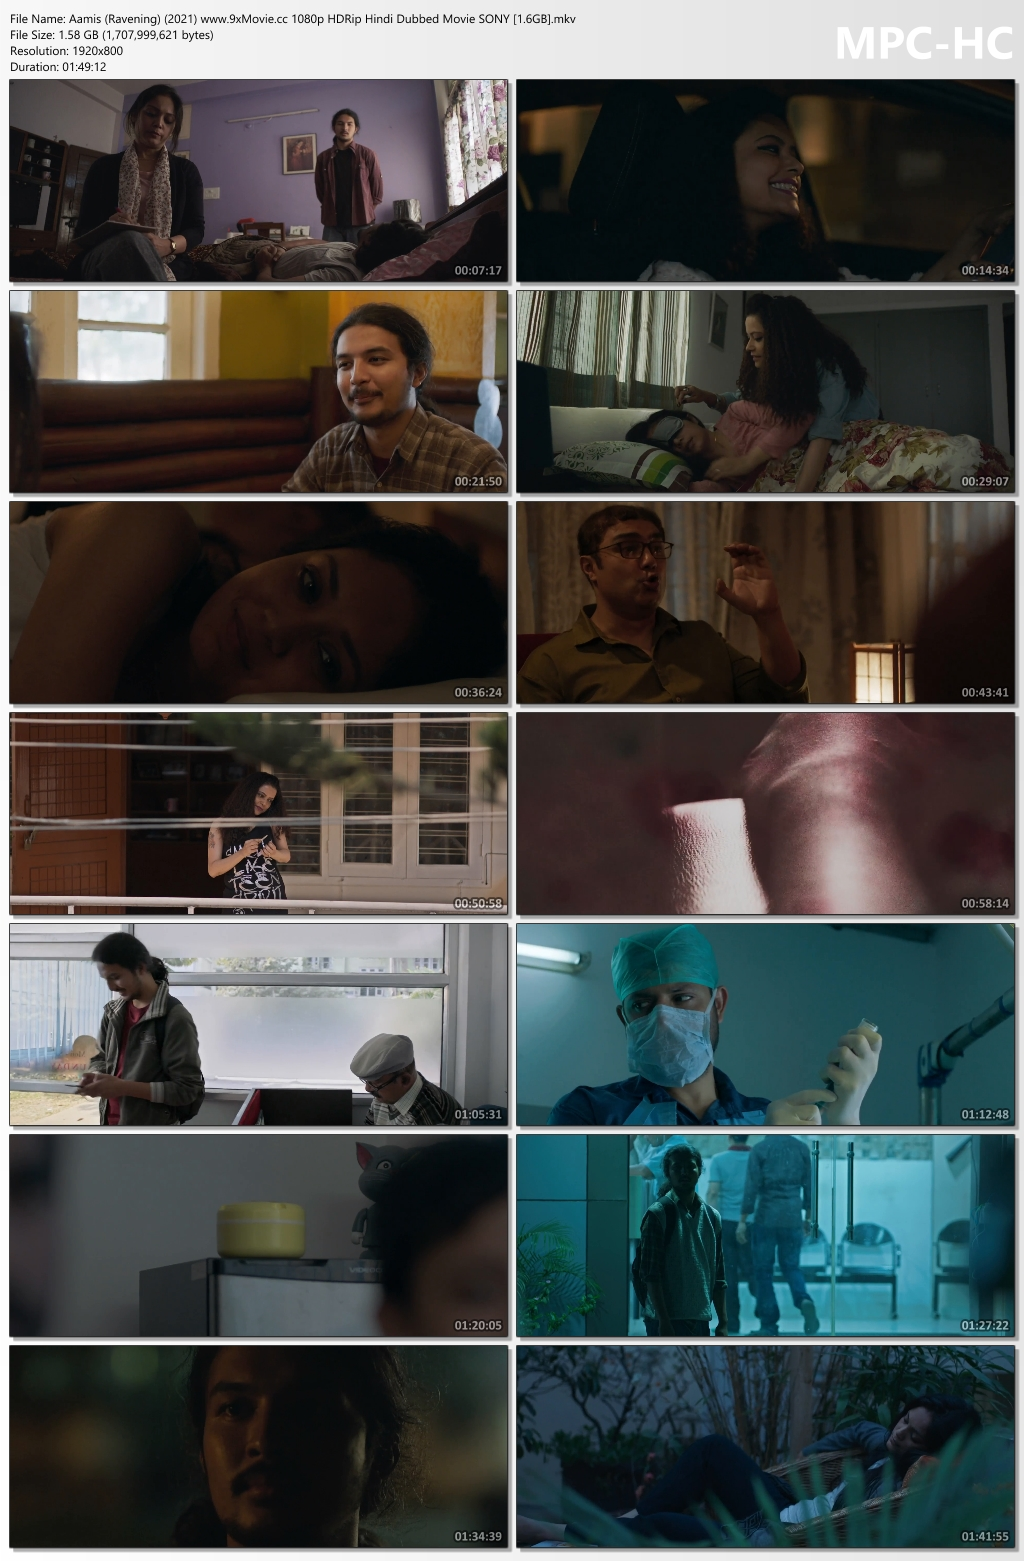 Aamis-Ravening-2021-www-9x-Movie-cc-1080p-HDRip-Hindi-Dubbed-Movie-SONY-1-6-GB-mkv